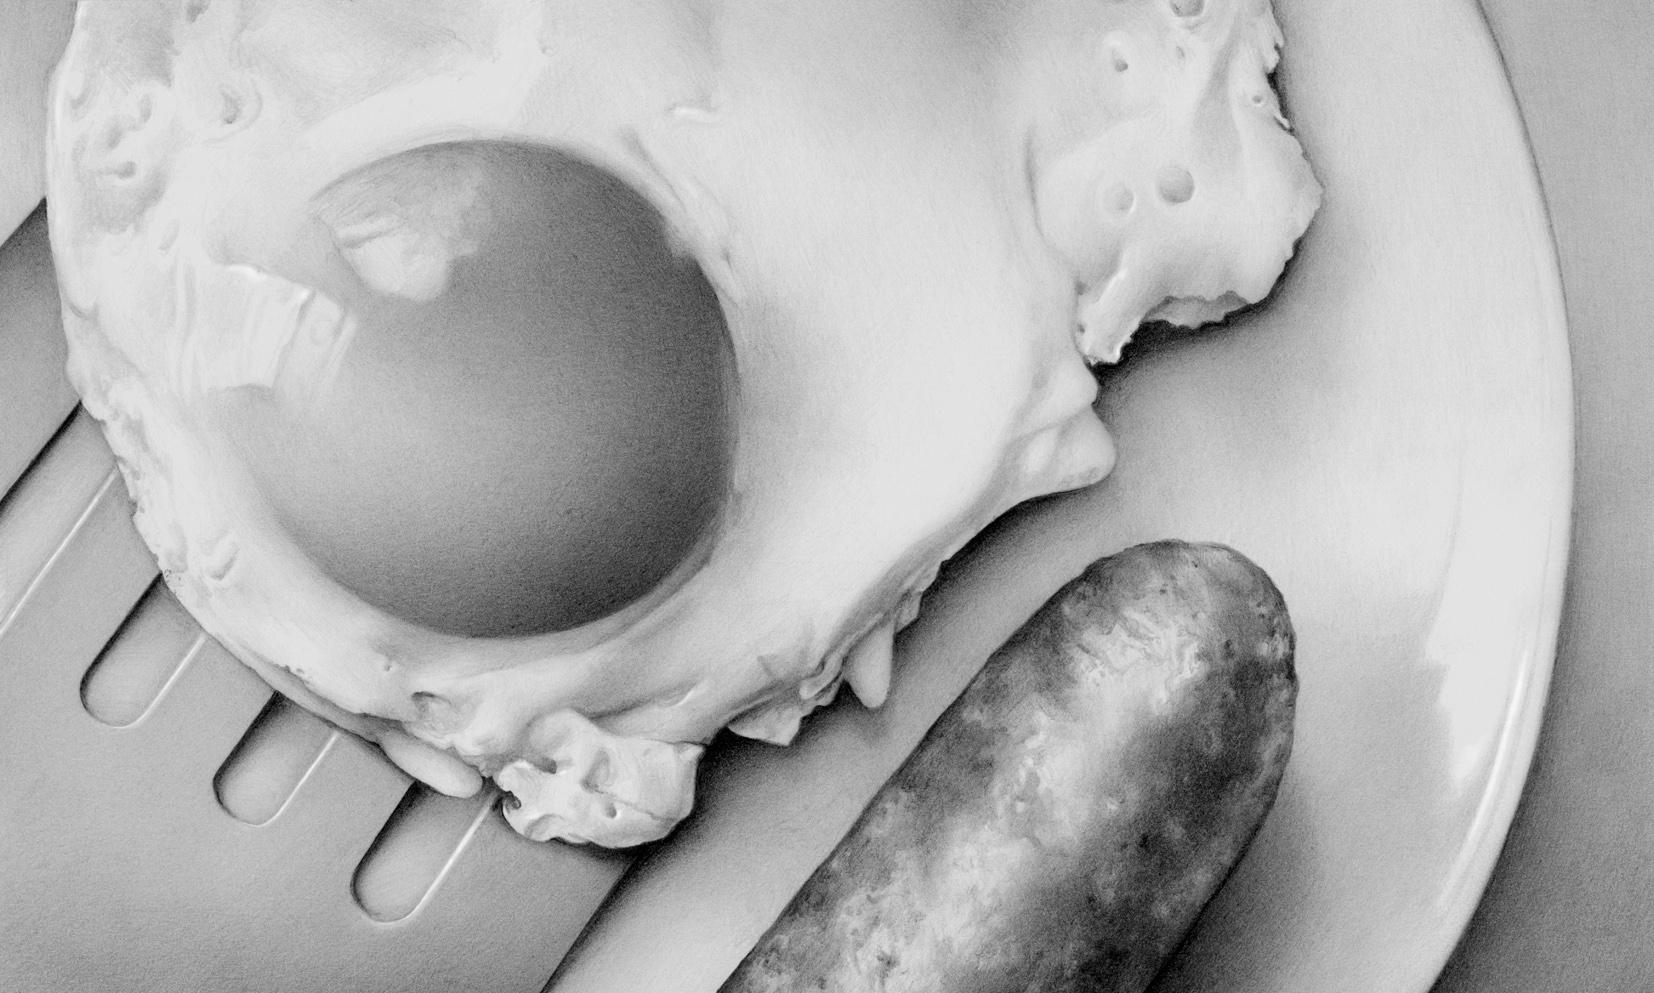 Food Fried Egg And Sausage